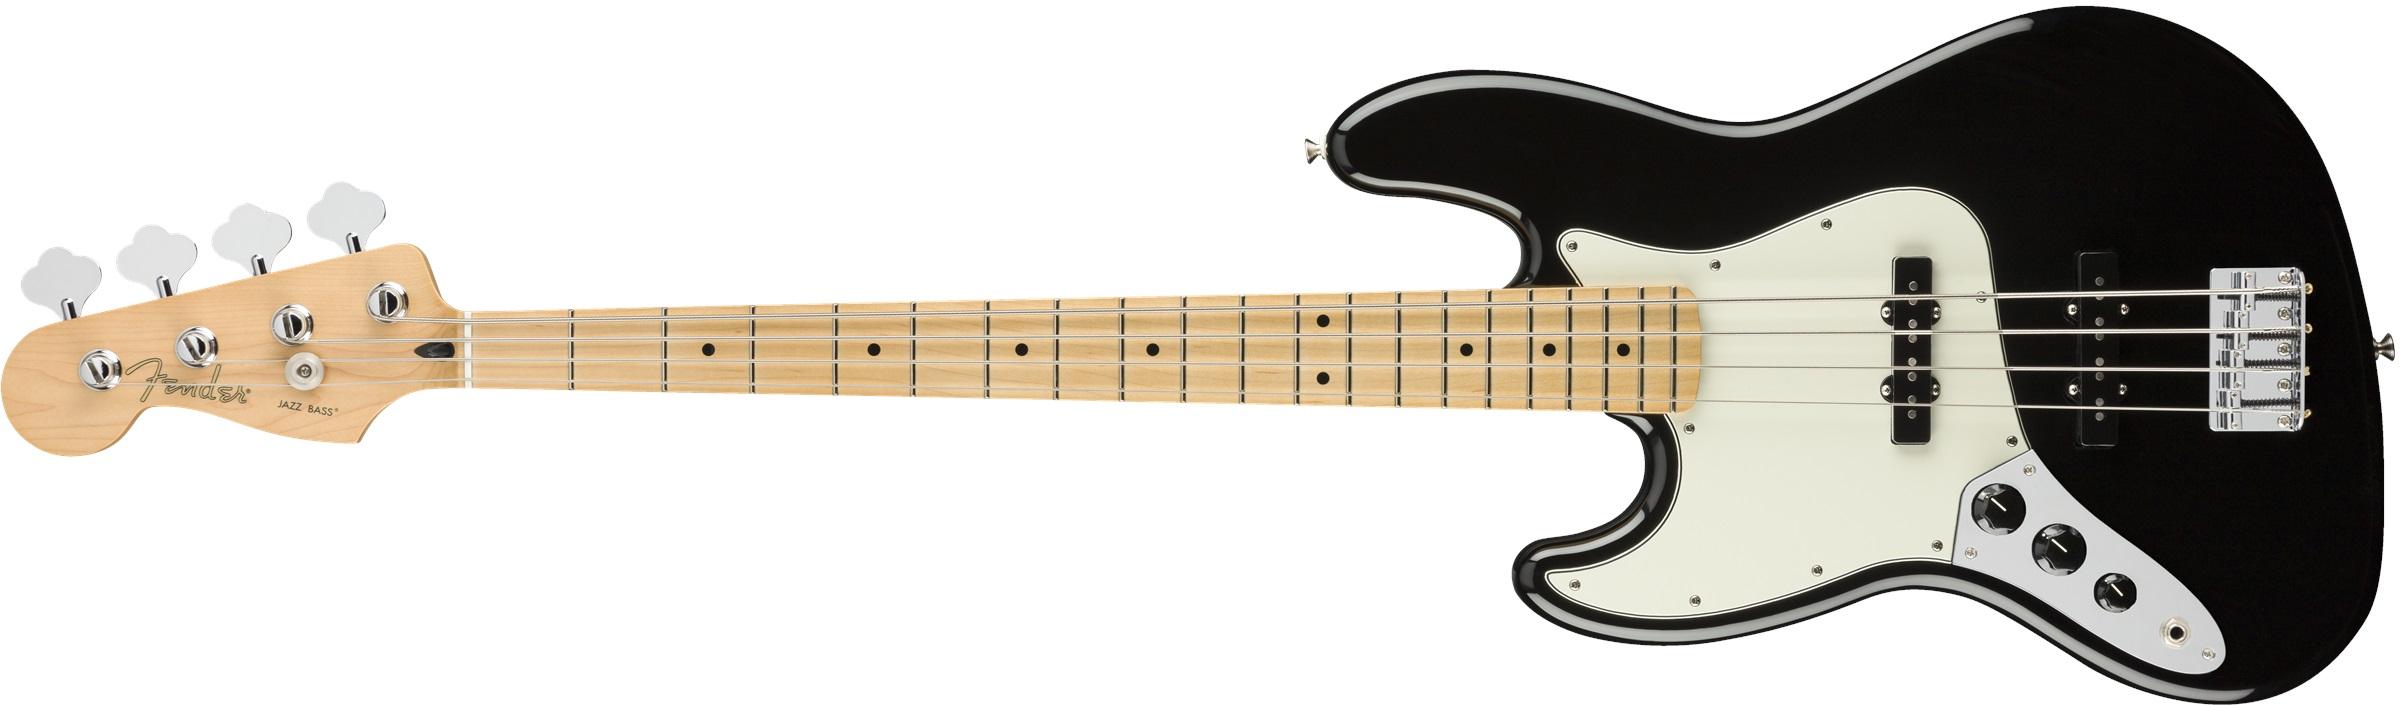 Fender PLAYER JAZZ BASS LH MN BLK